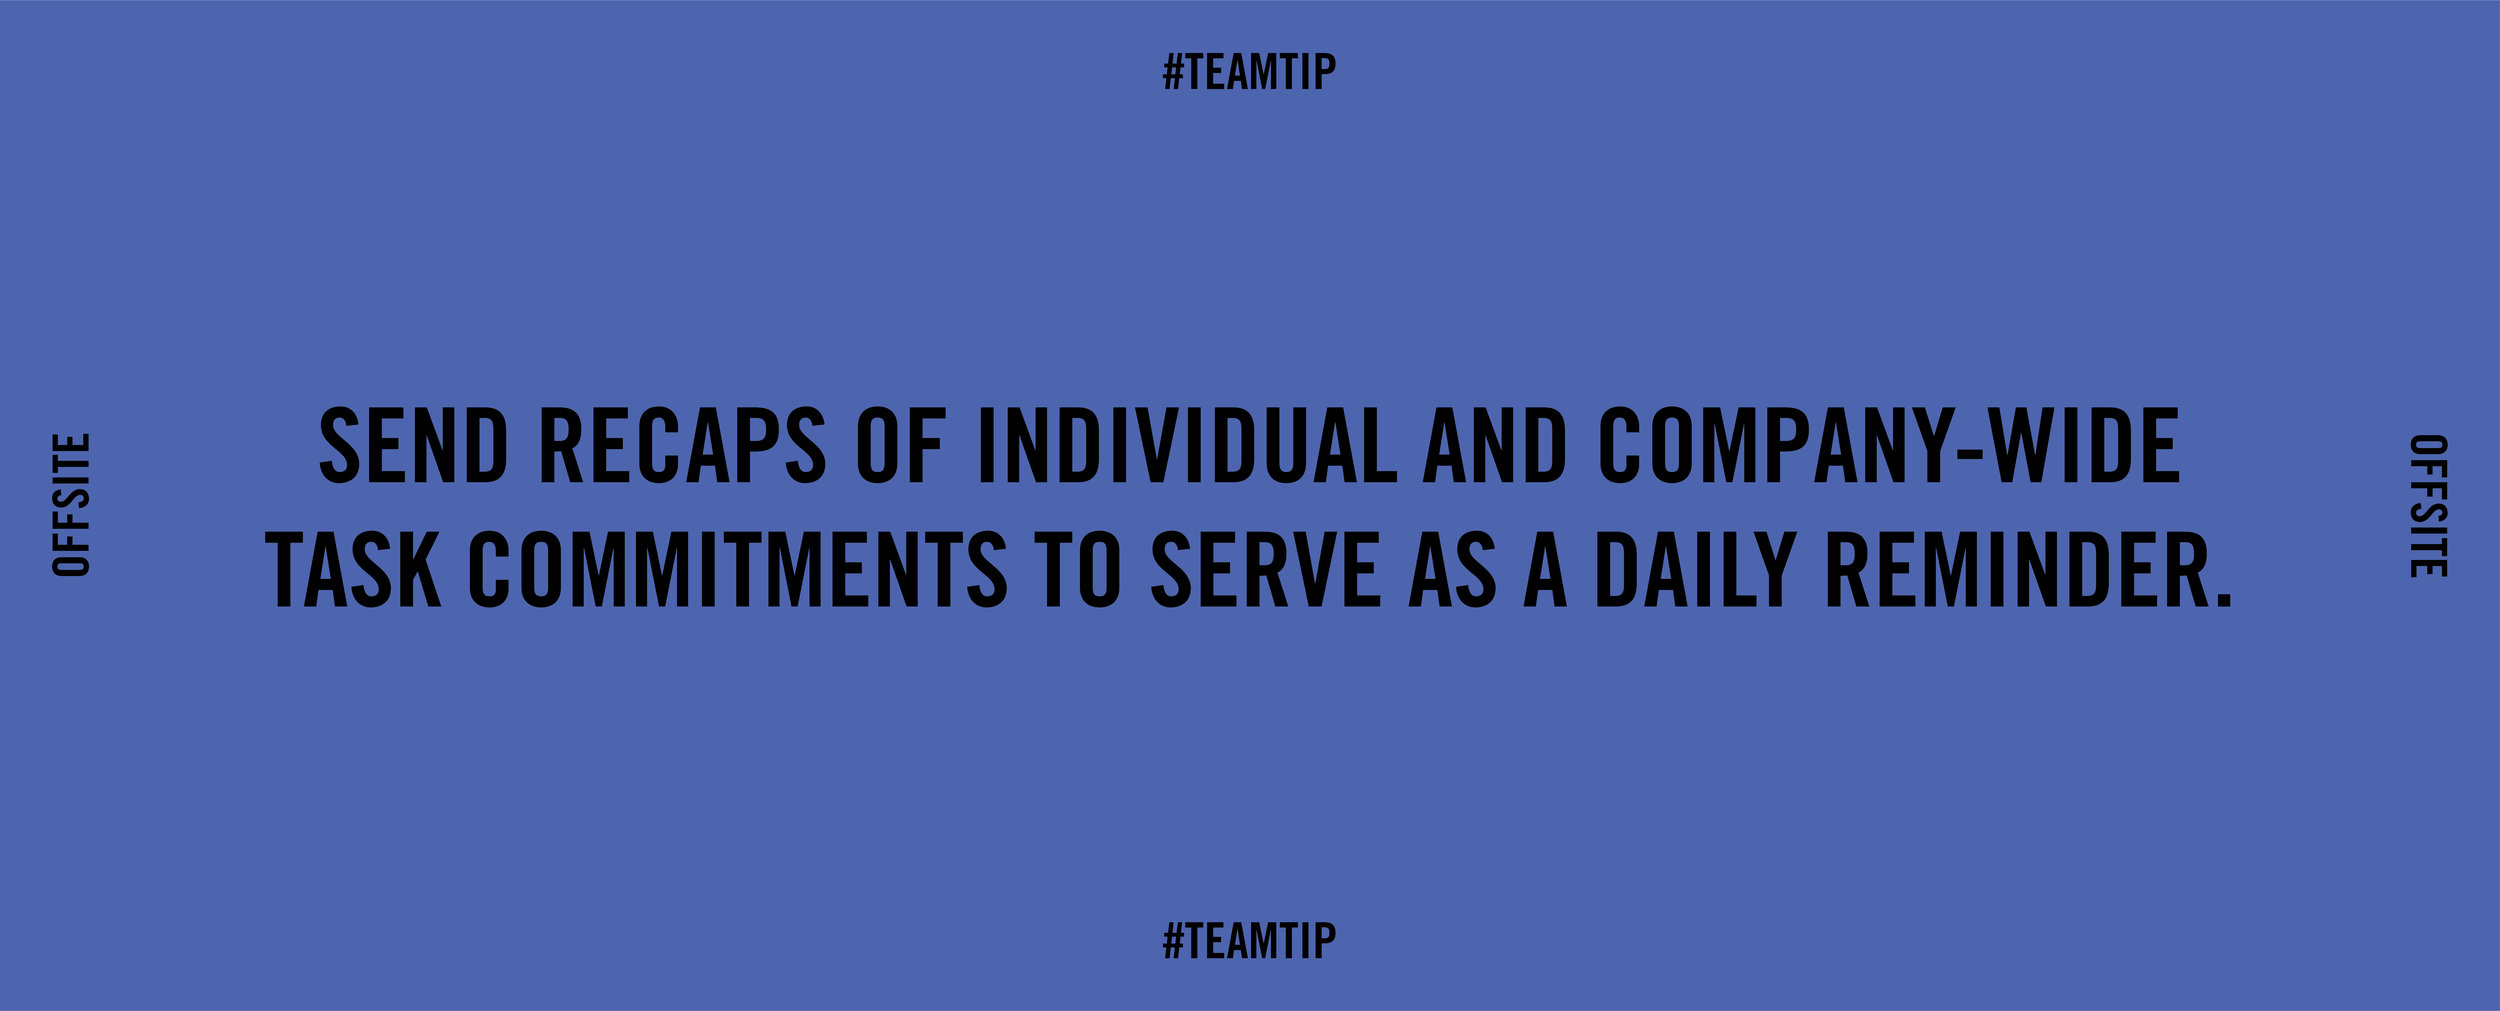 team-tip-04.jpg